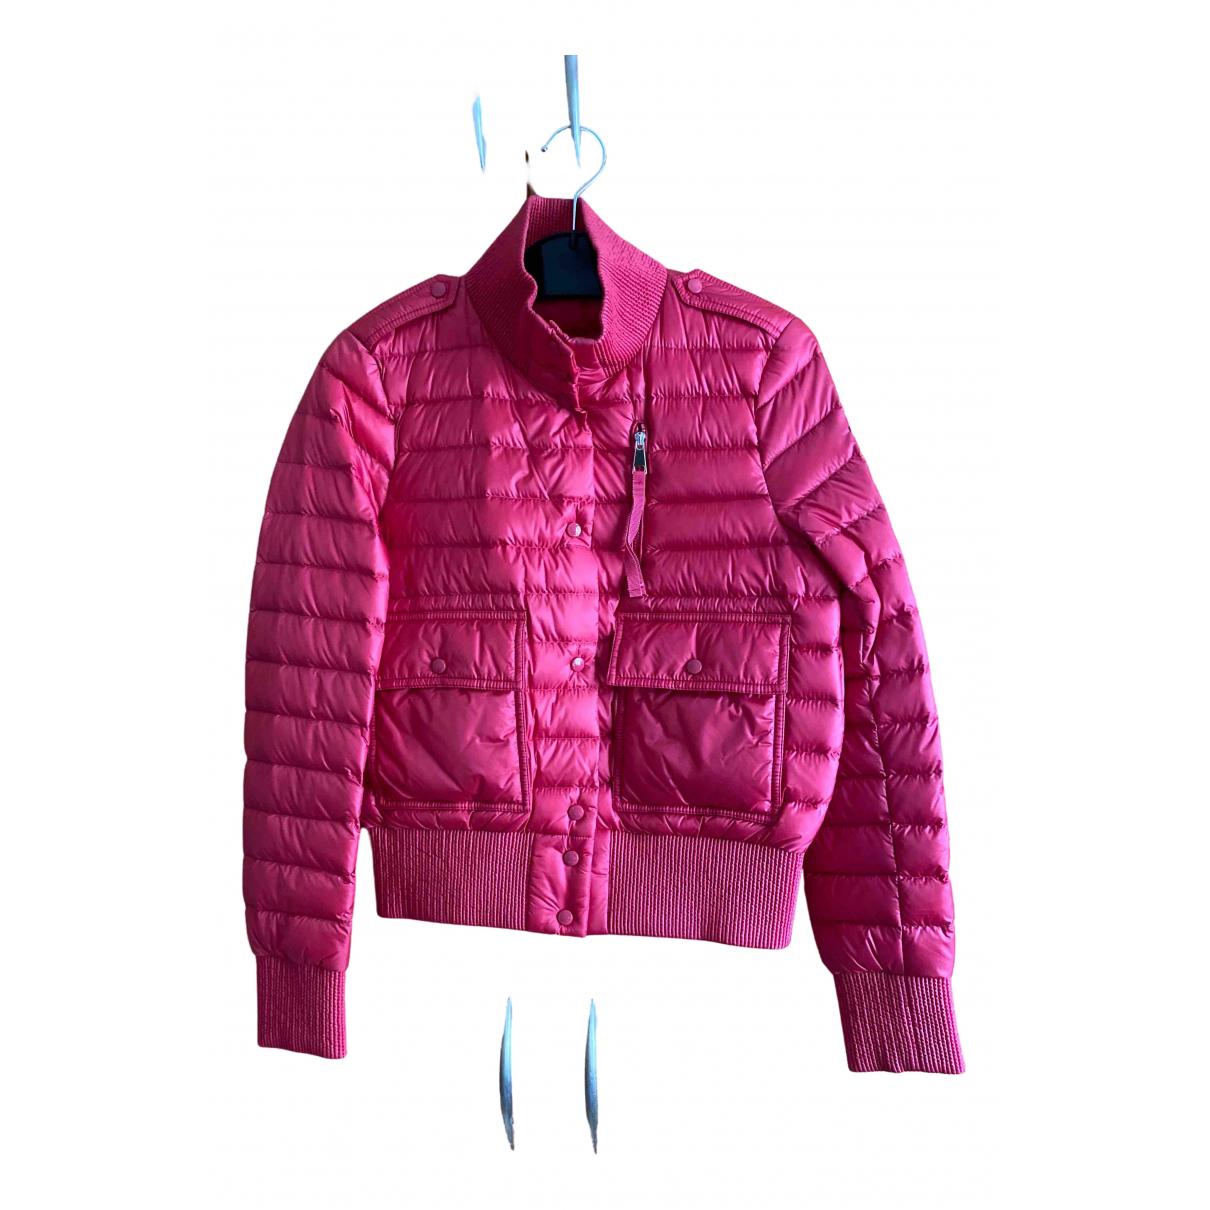 Moncler \N Pink coat for Women 1 0-5